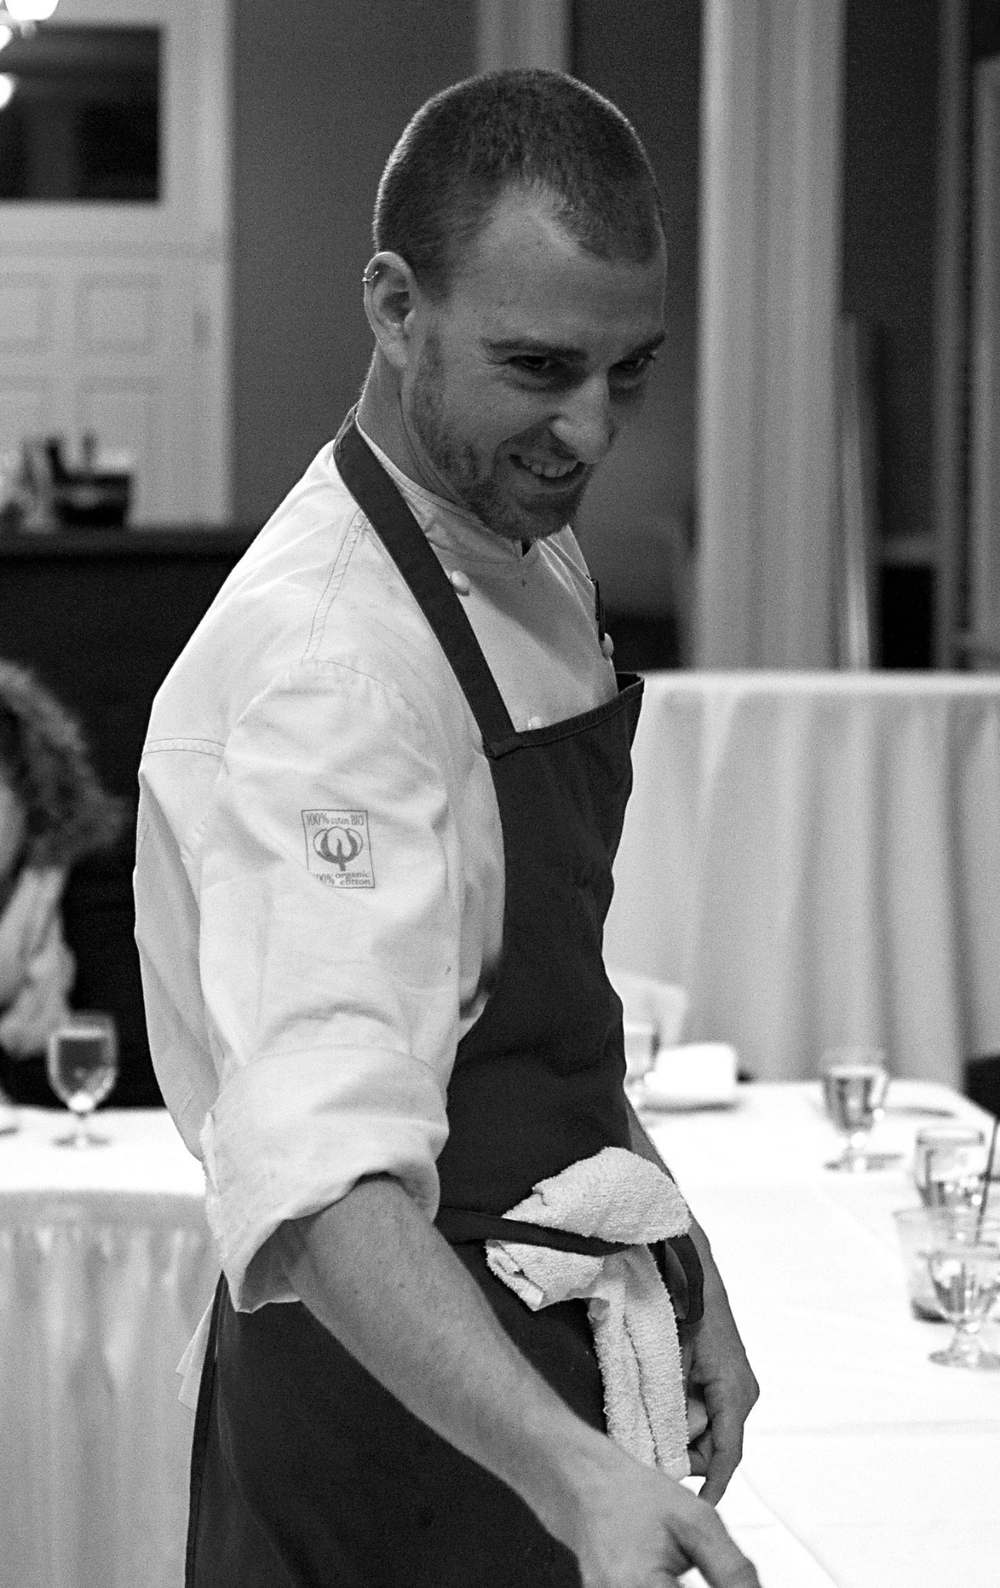 Stu Hummel  Owner / Chefarmer & Corporate Executive Chef  stu@epiphanyfarms.com